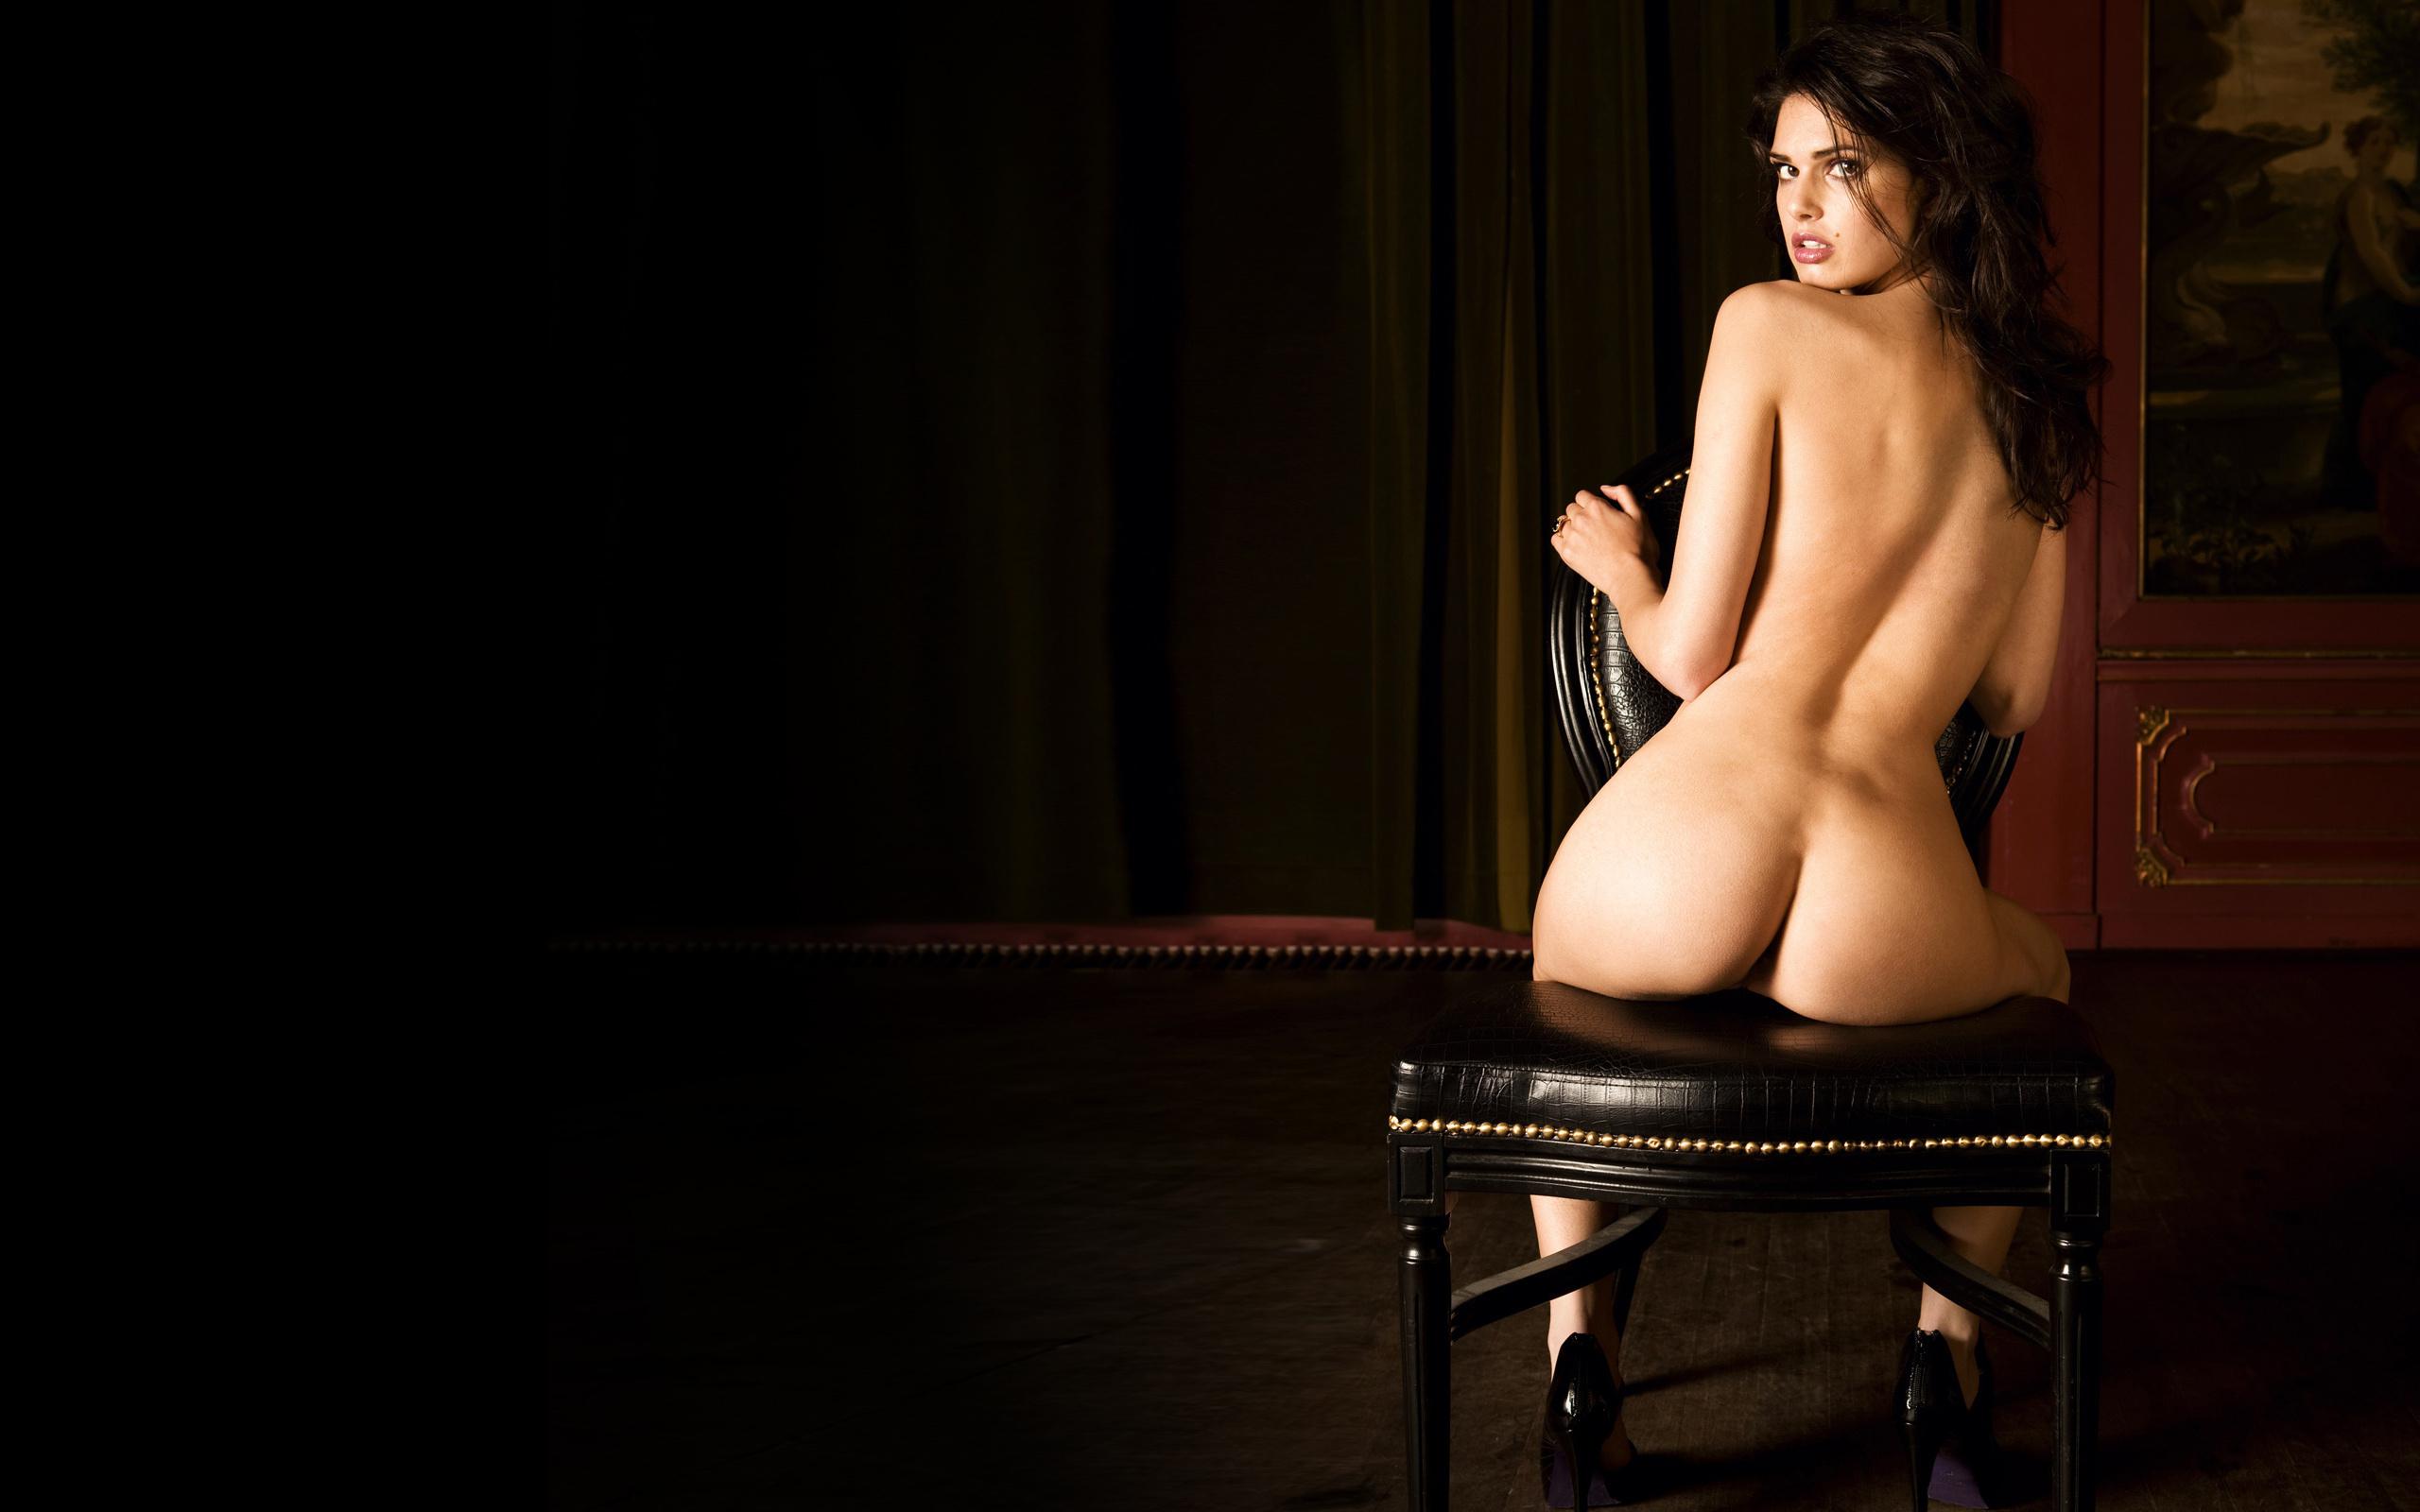 Эротика брюнетка стул фото может